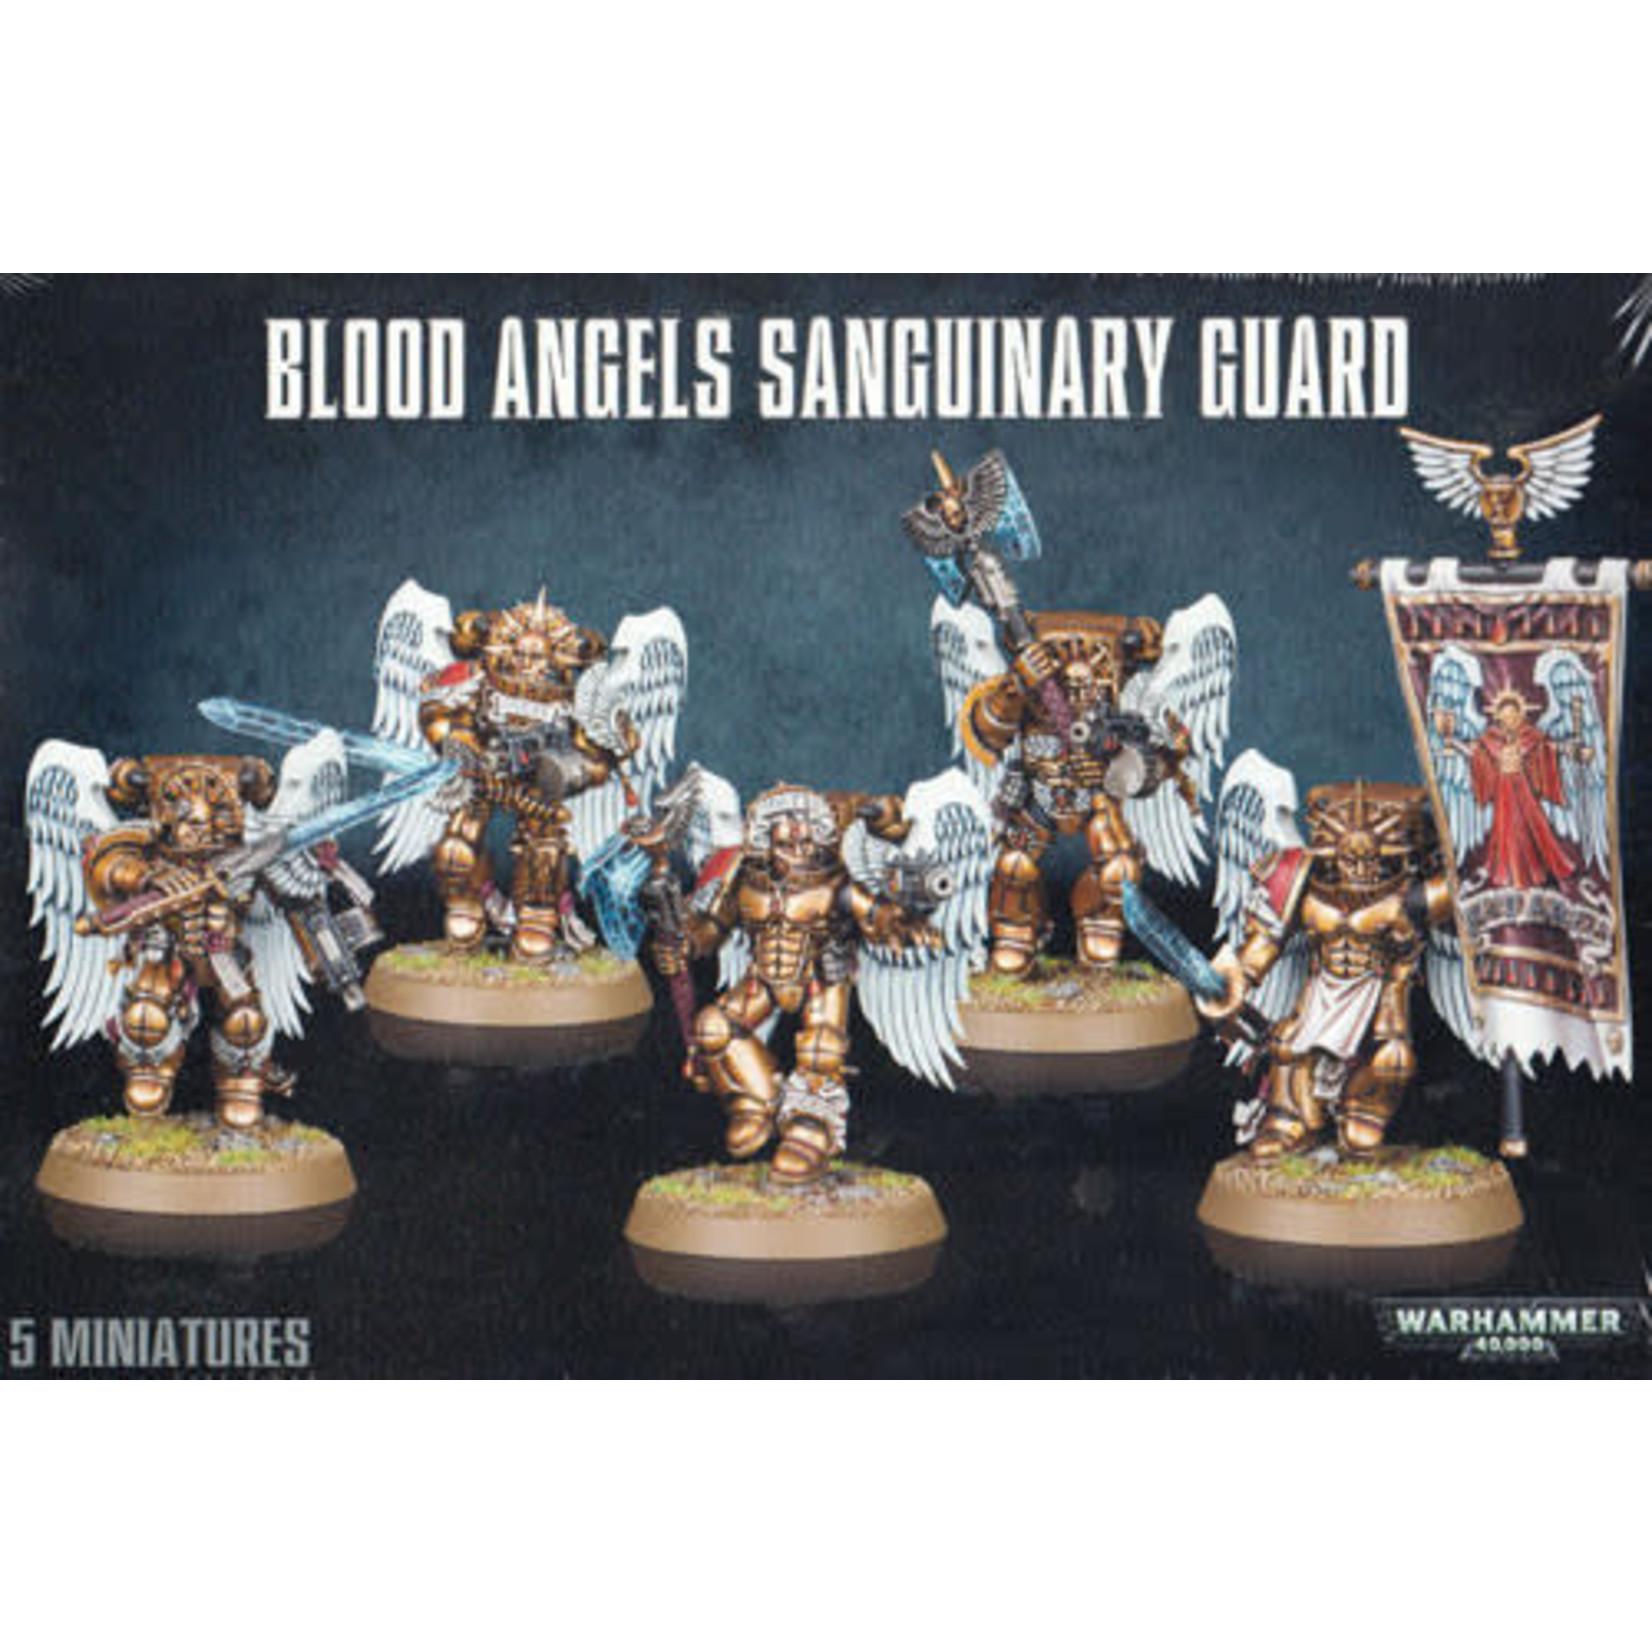 Blood Angel Sanguine Guard (40K)